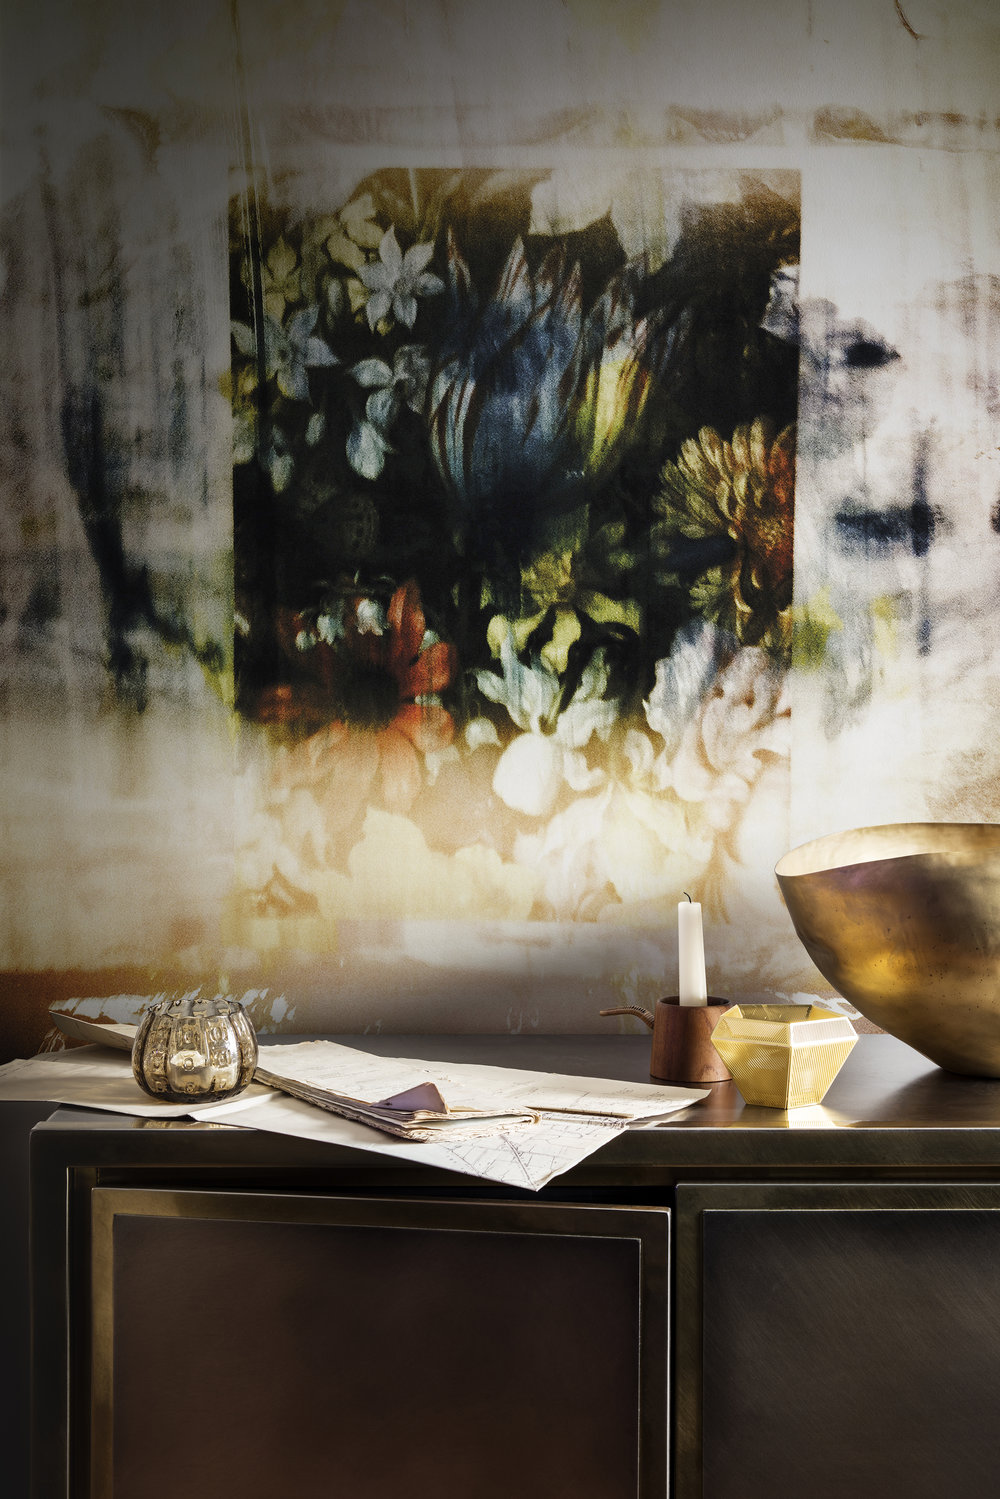 Captured Florals Mural byEmmeline Kellett from Abstraction Edit